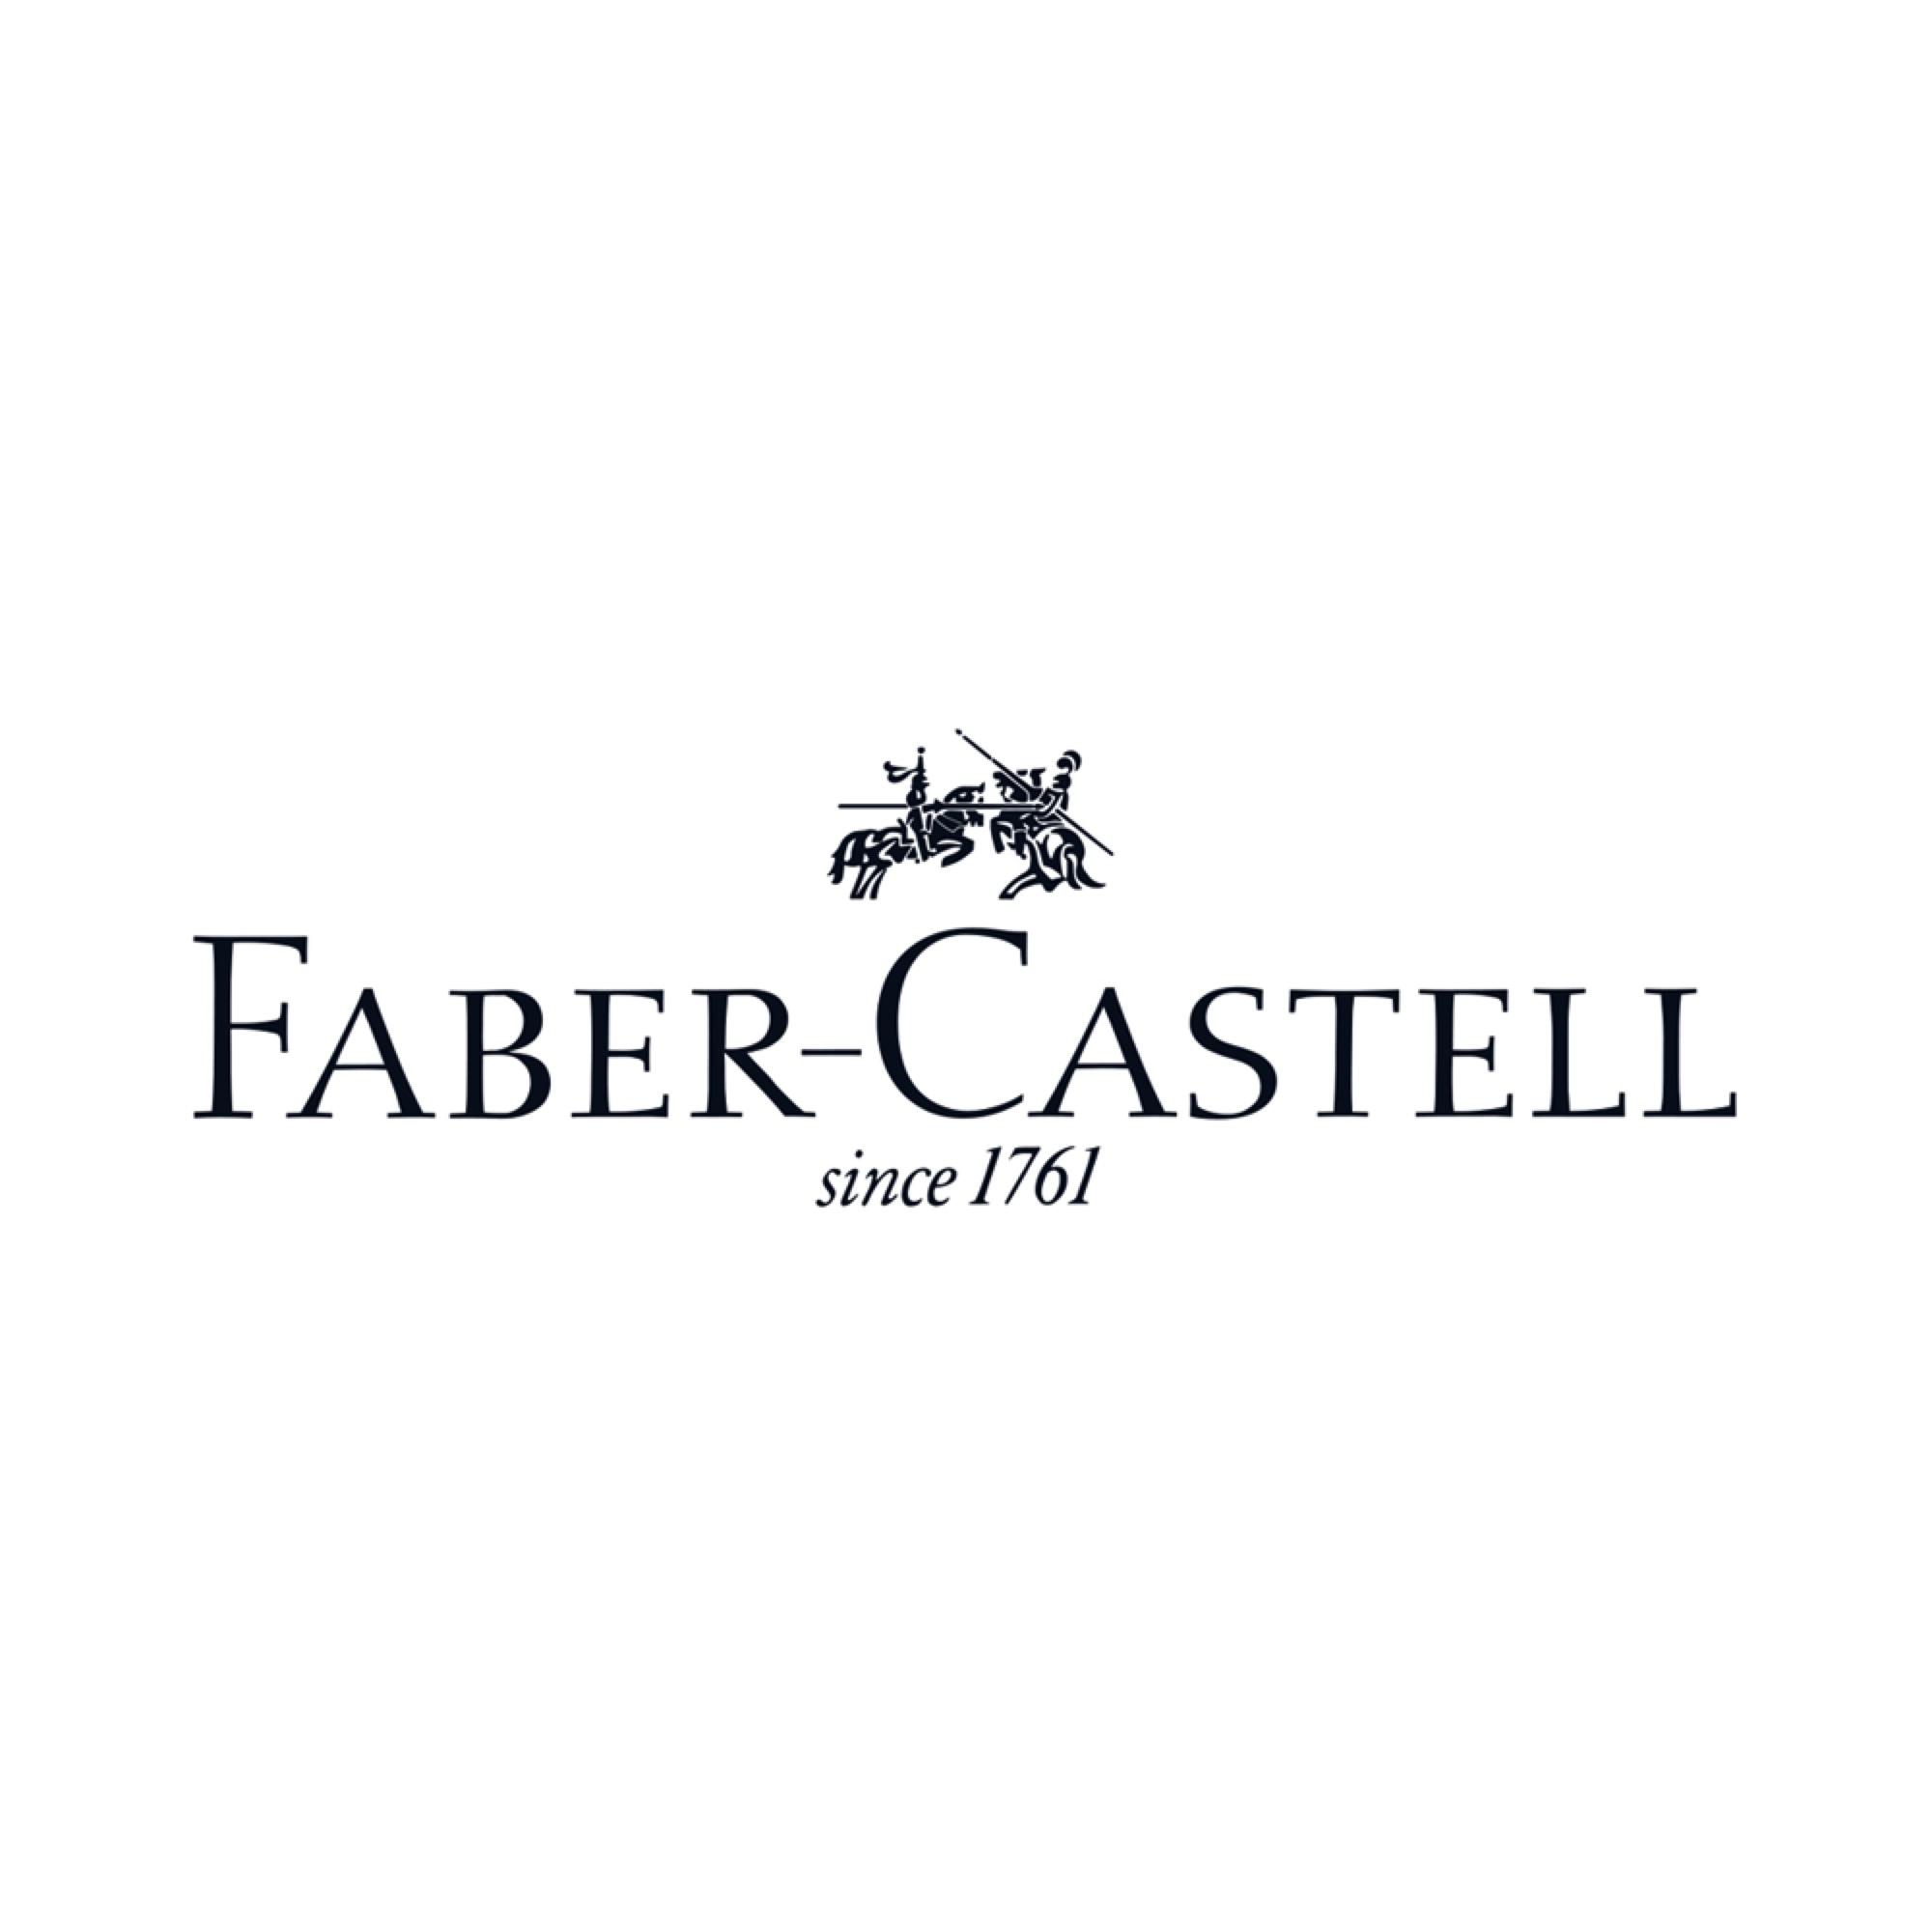 Faber Castell Square.jpg